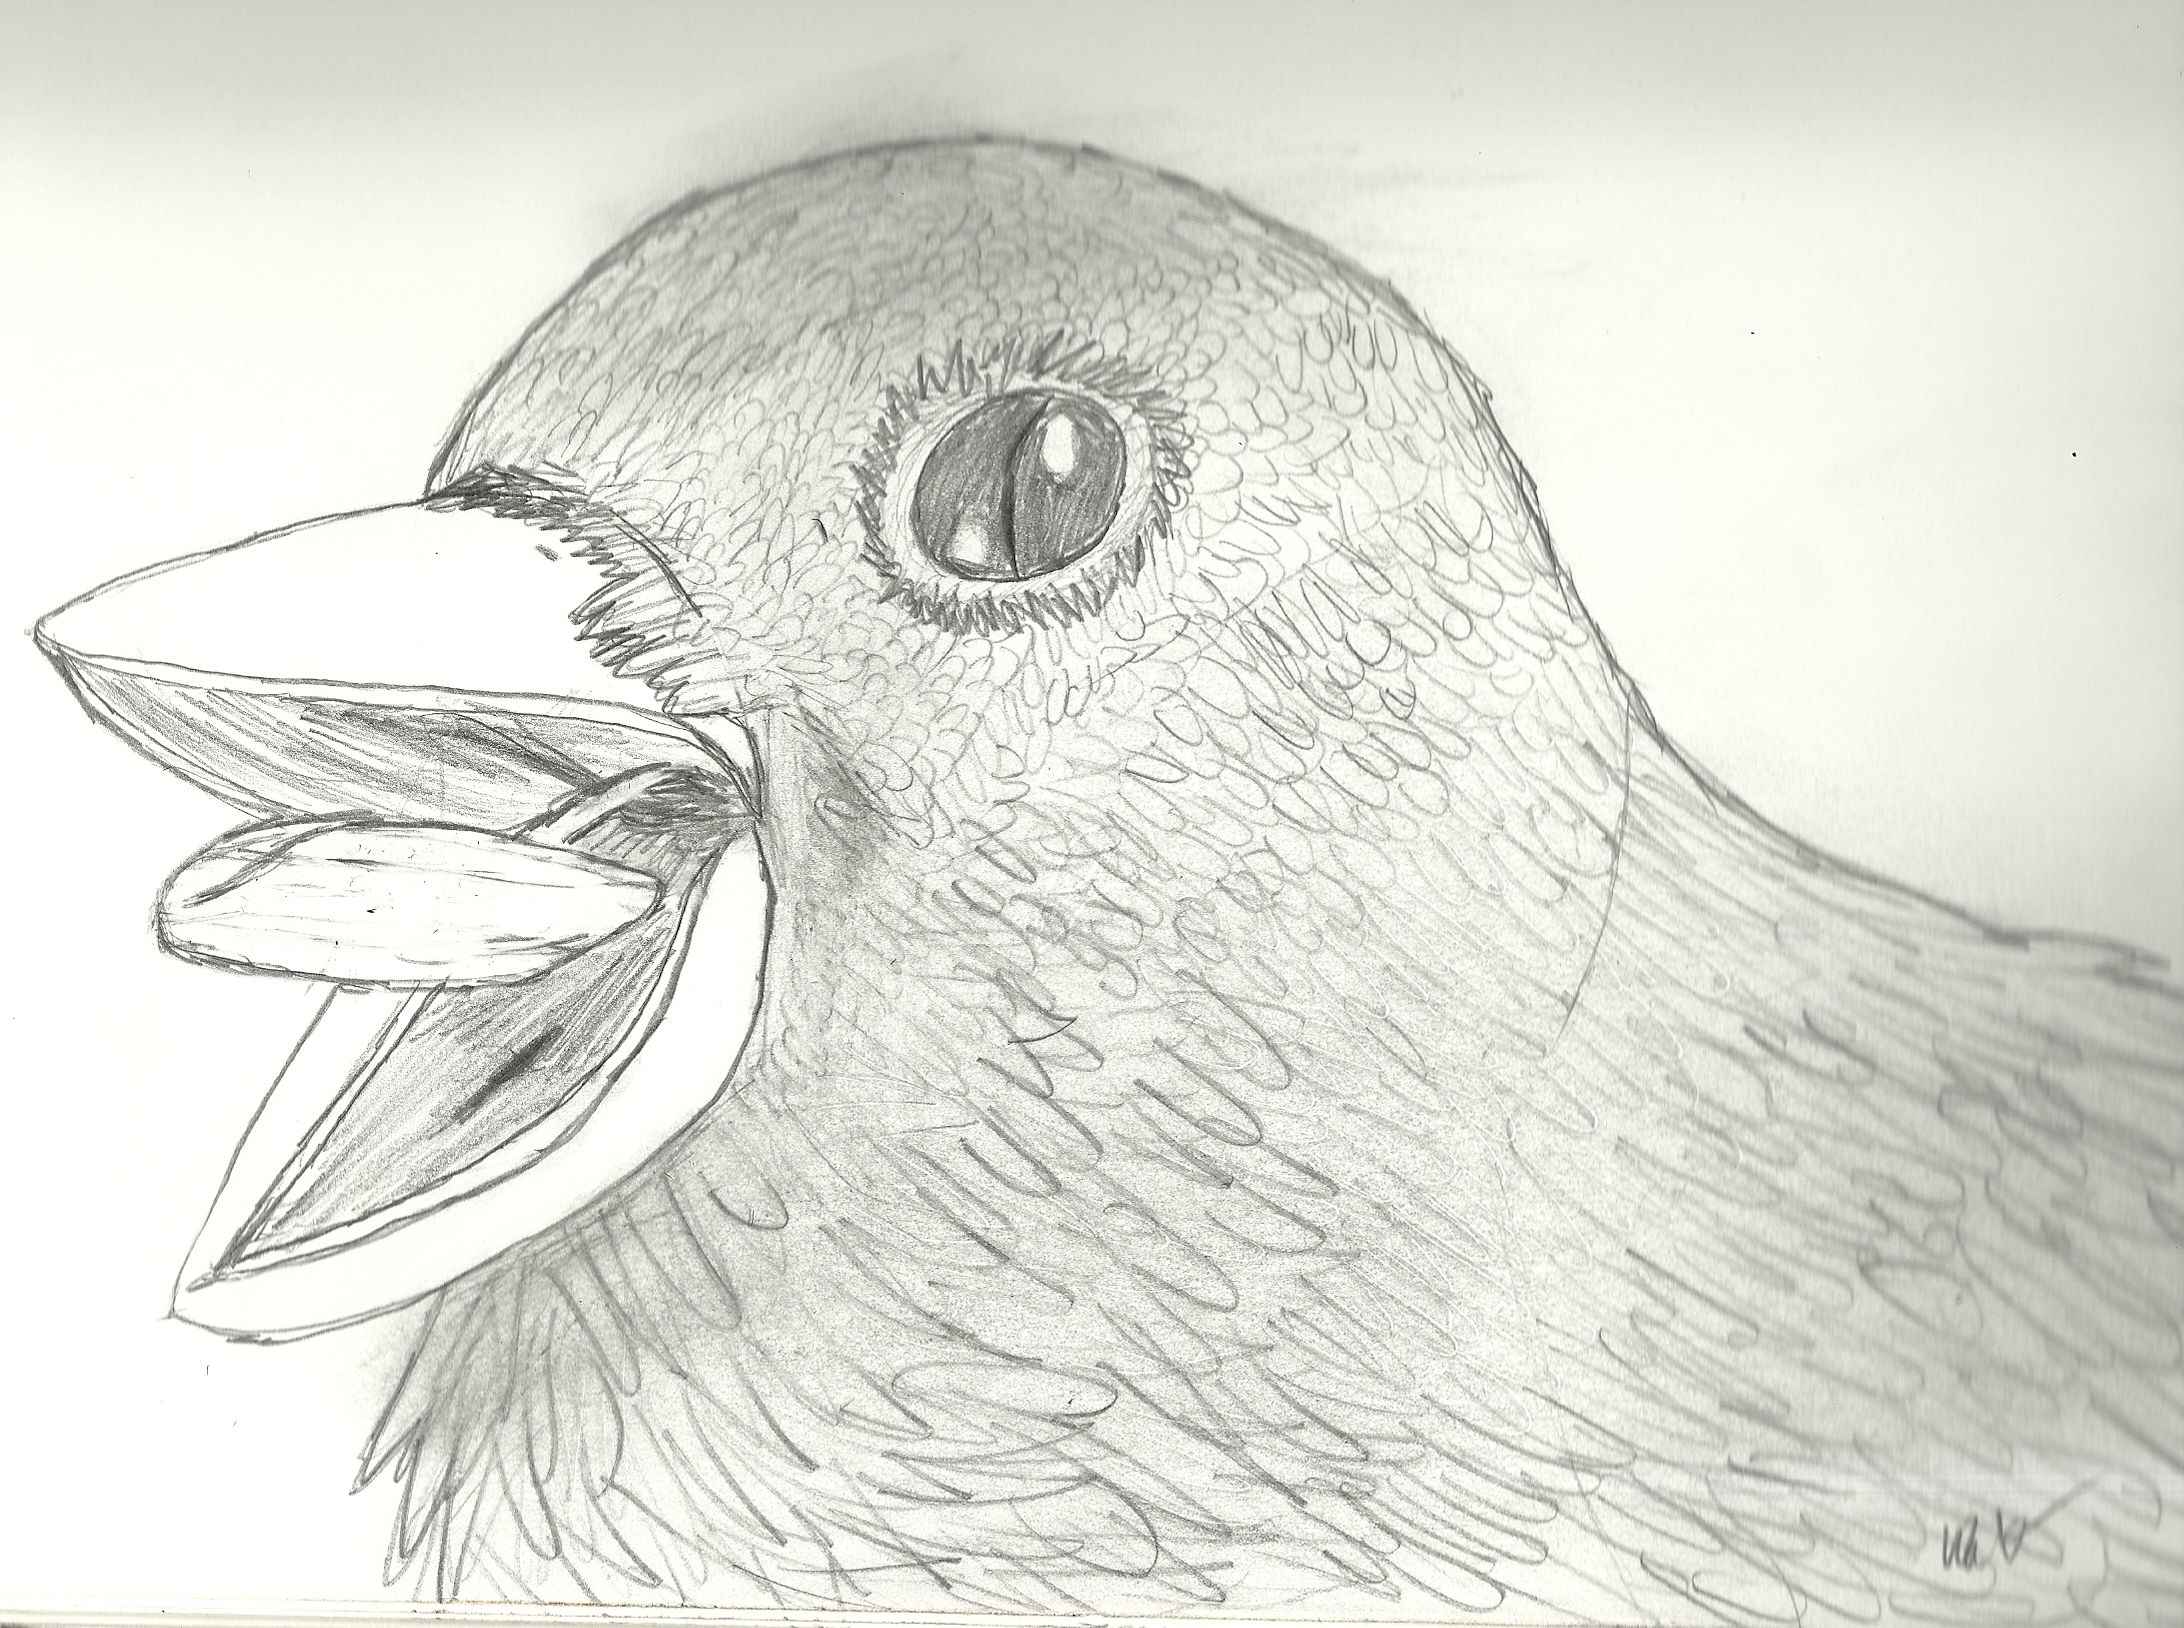 Sketch of a Bird